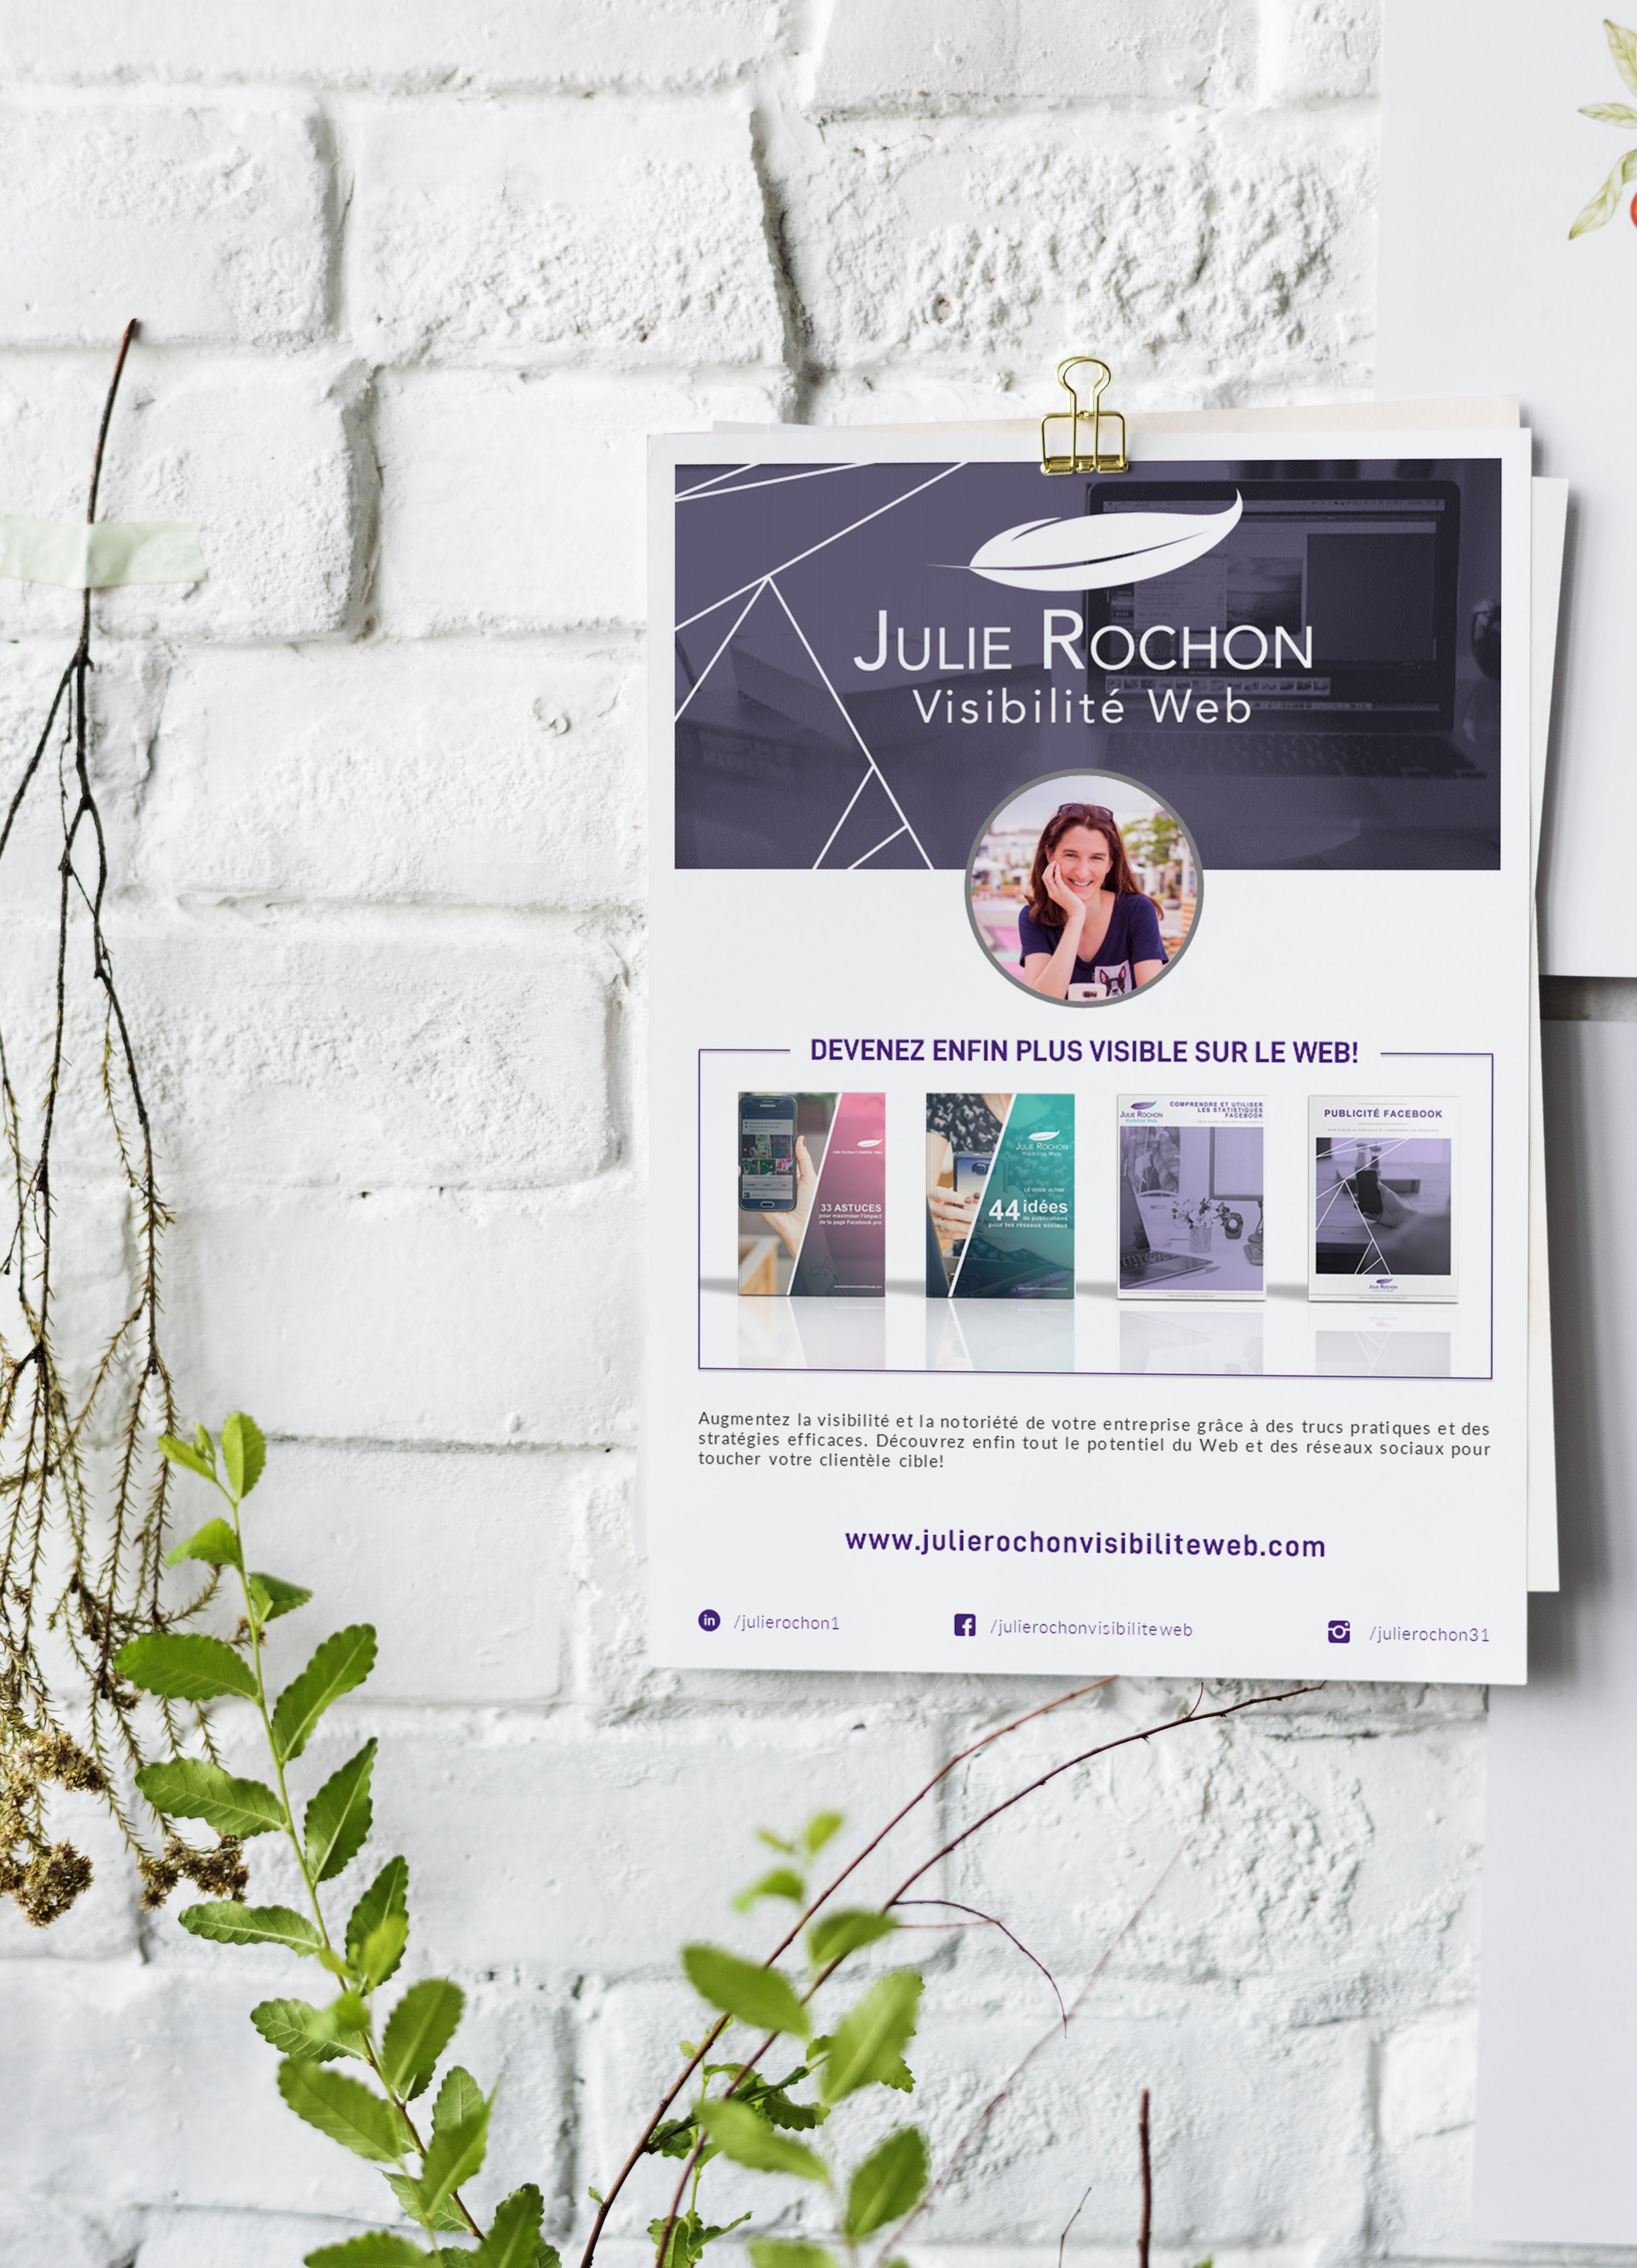 Julie Rochon